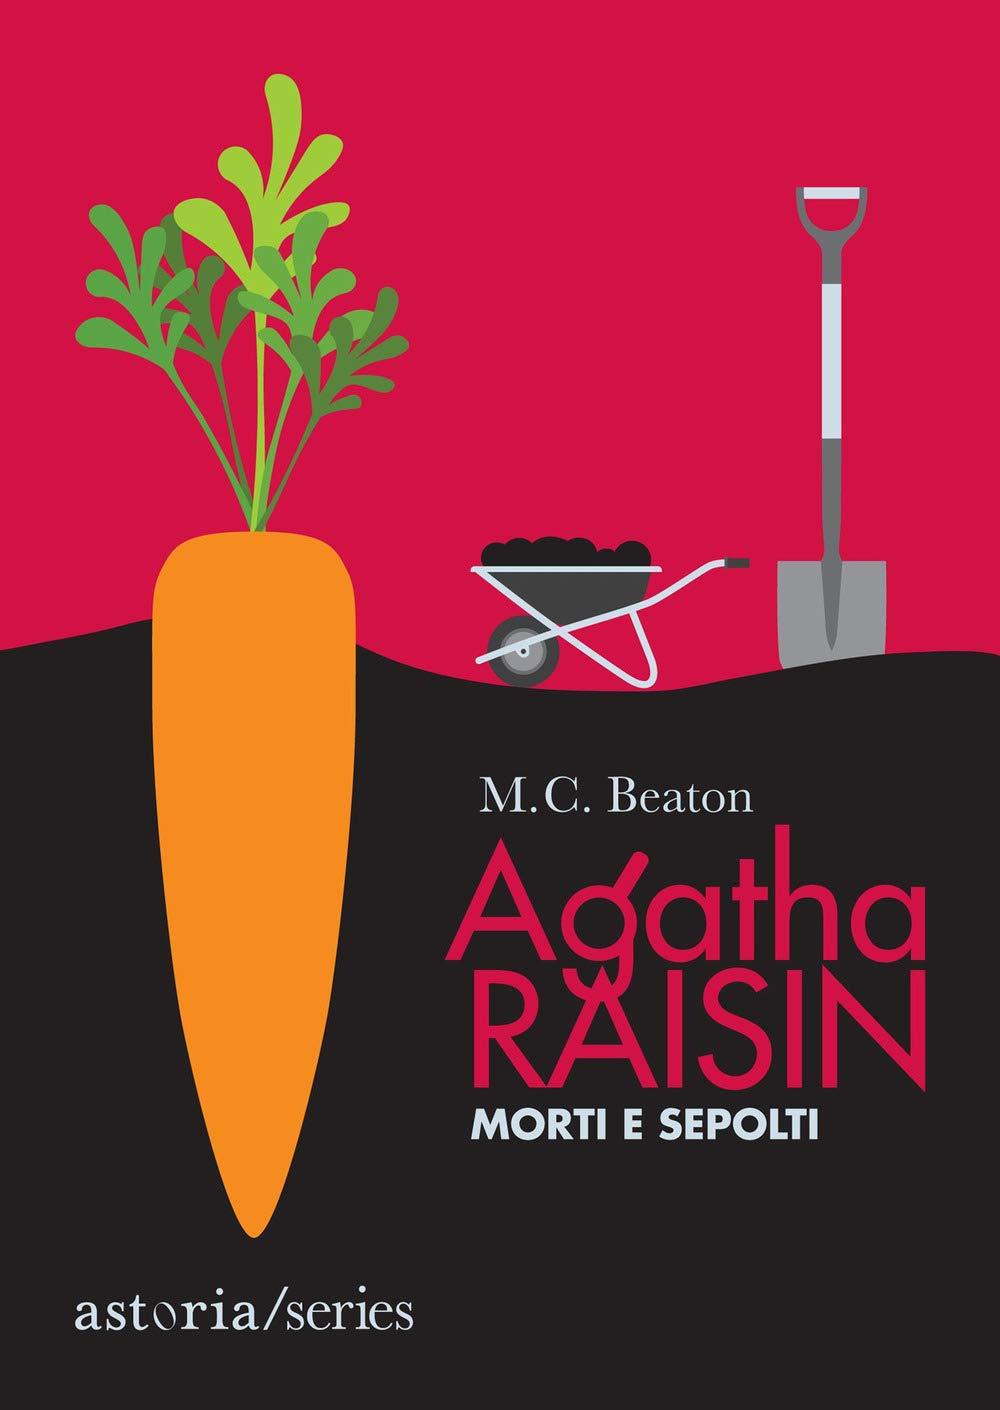 Morti e sepolti. Agatha Raisin : Beaton, M. C., Morpurgo, Marina:  Amazon.it: Libri